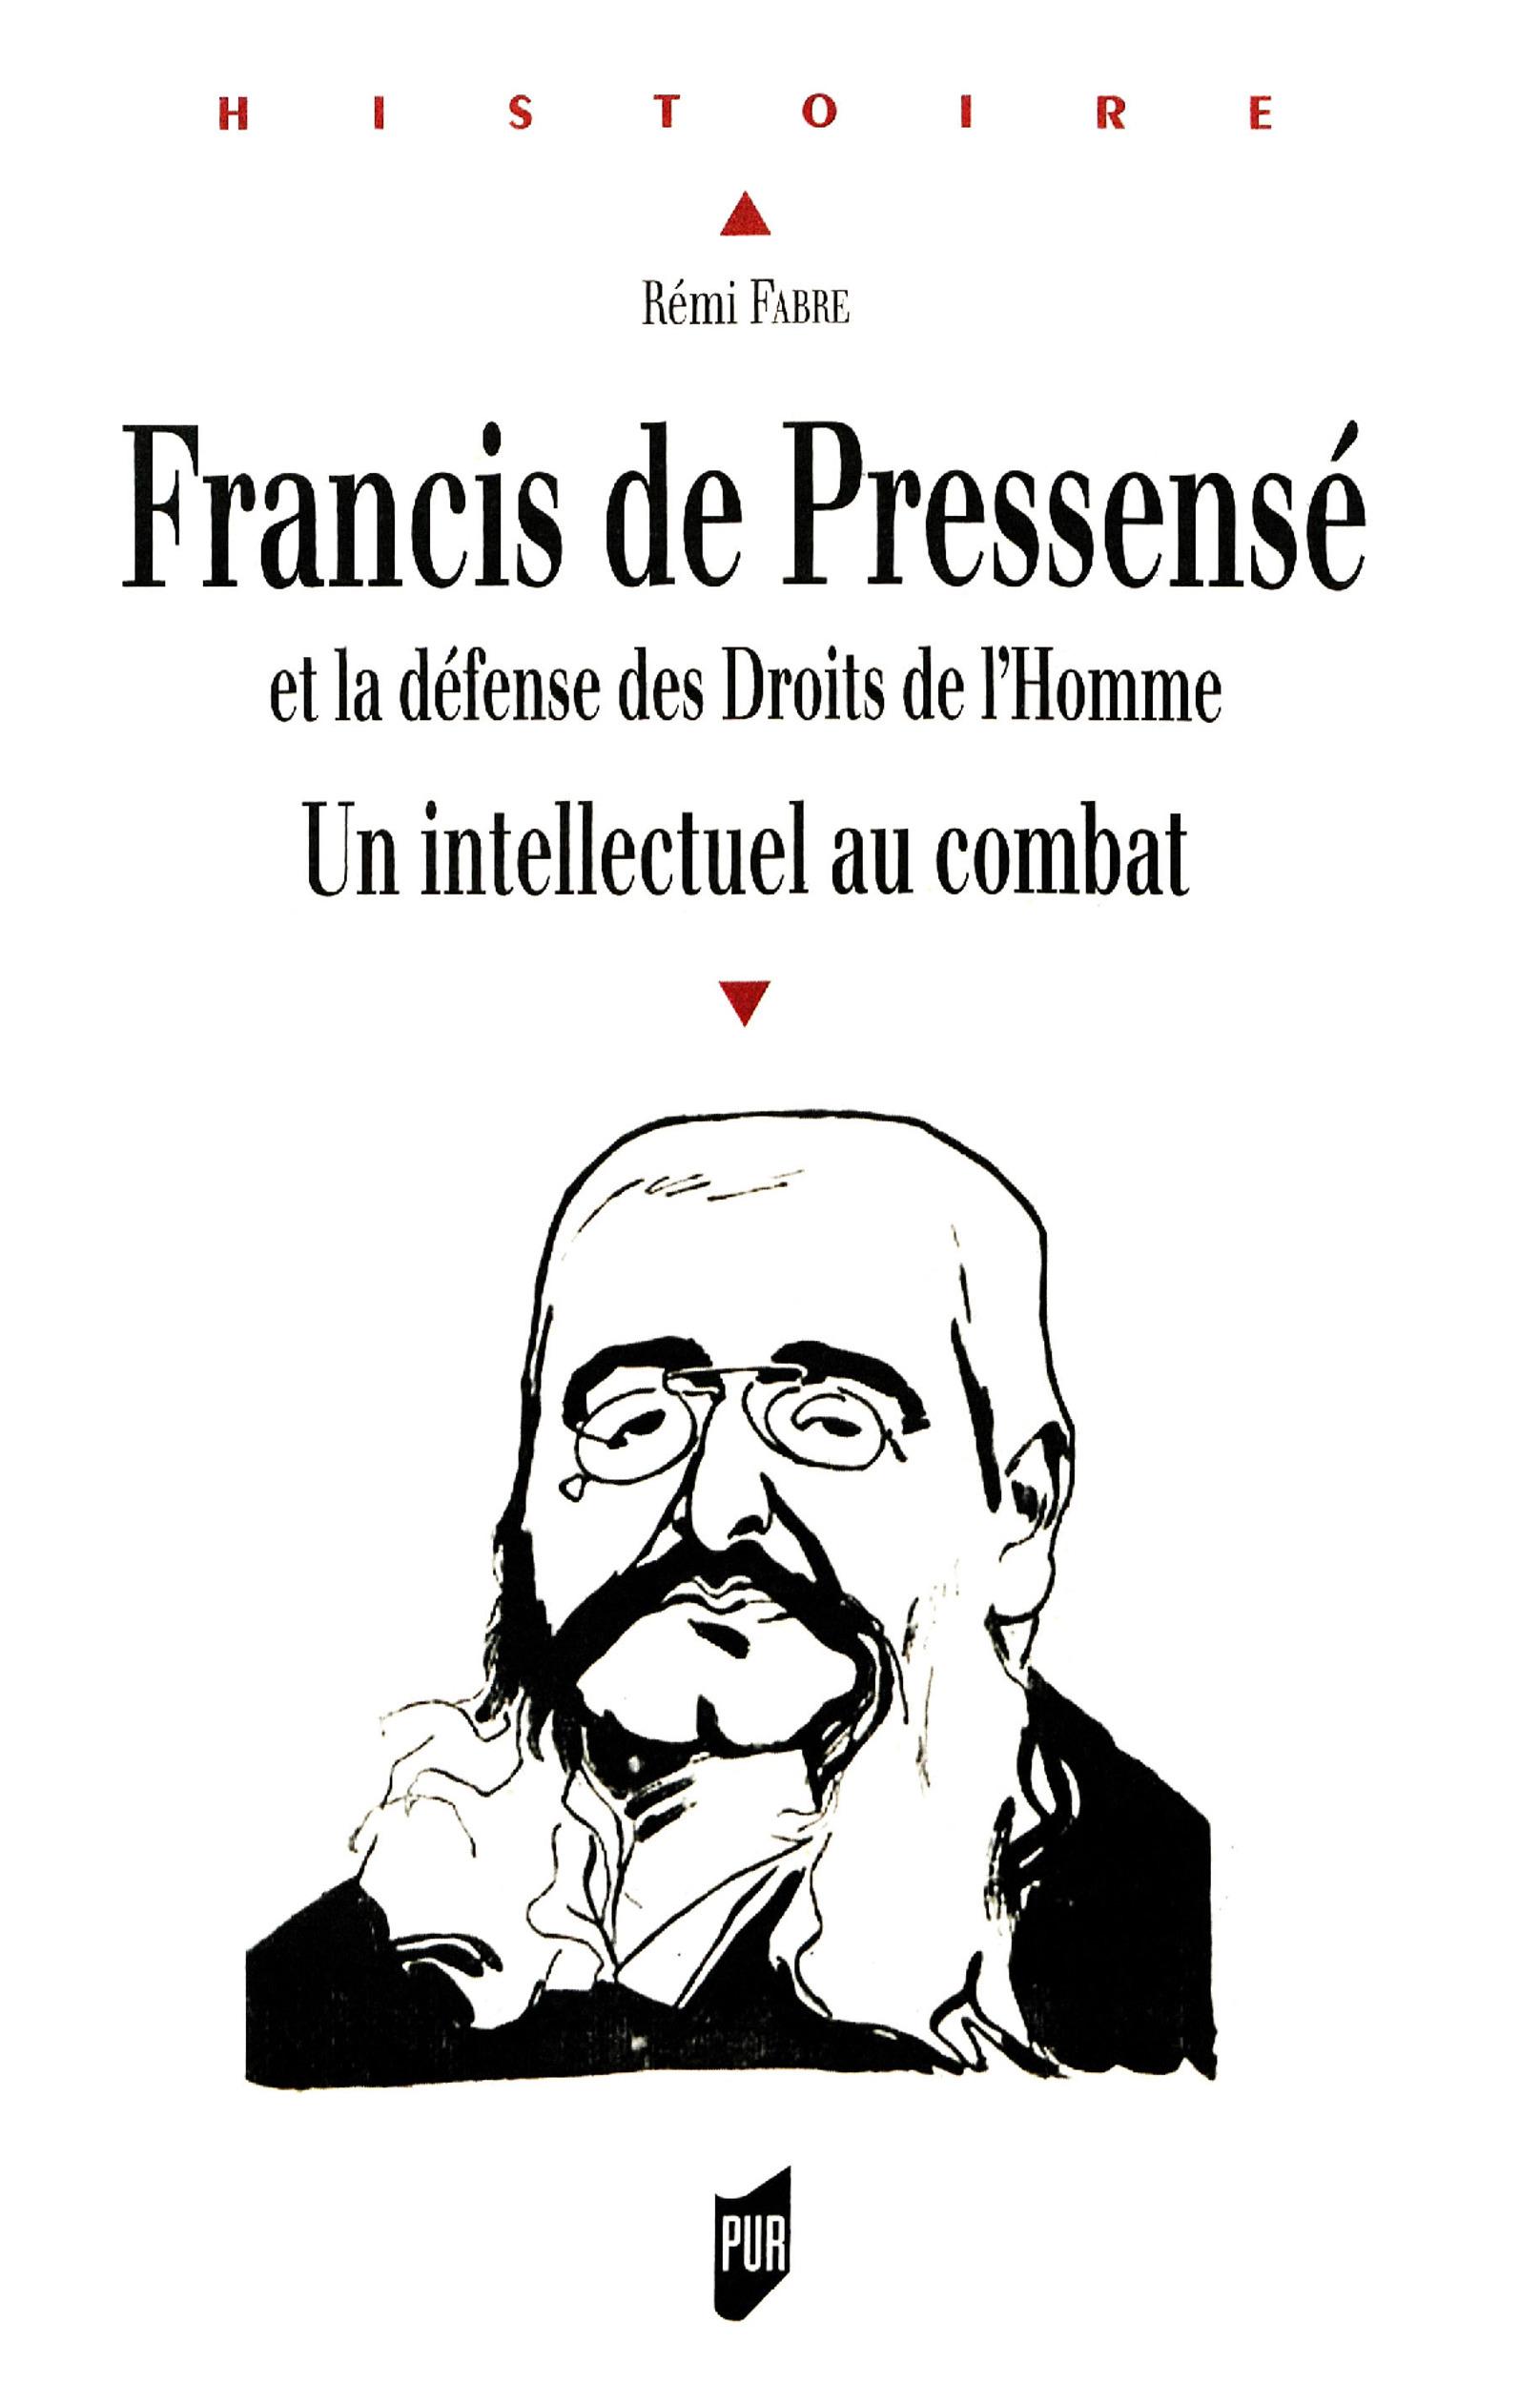 Francis de pressense (1853-1914)